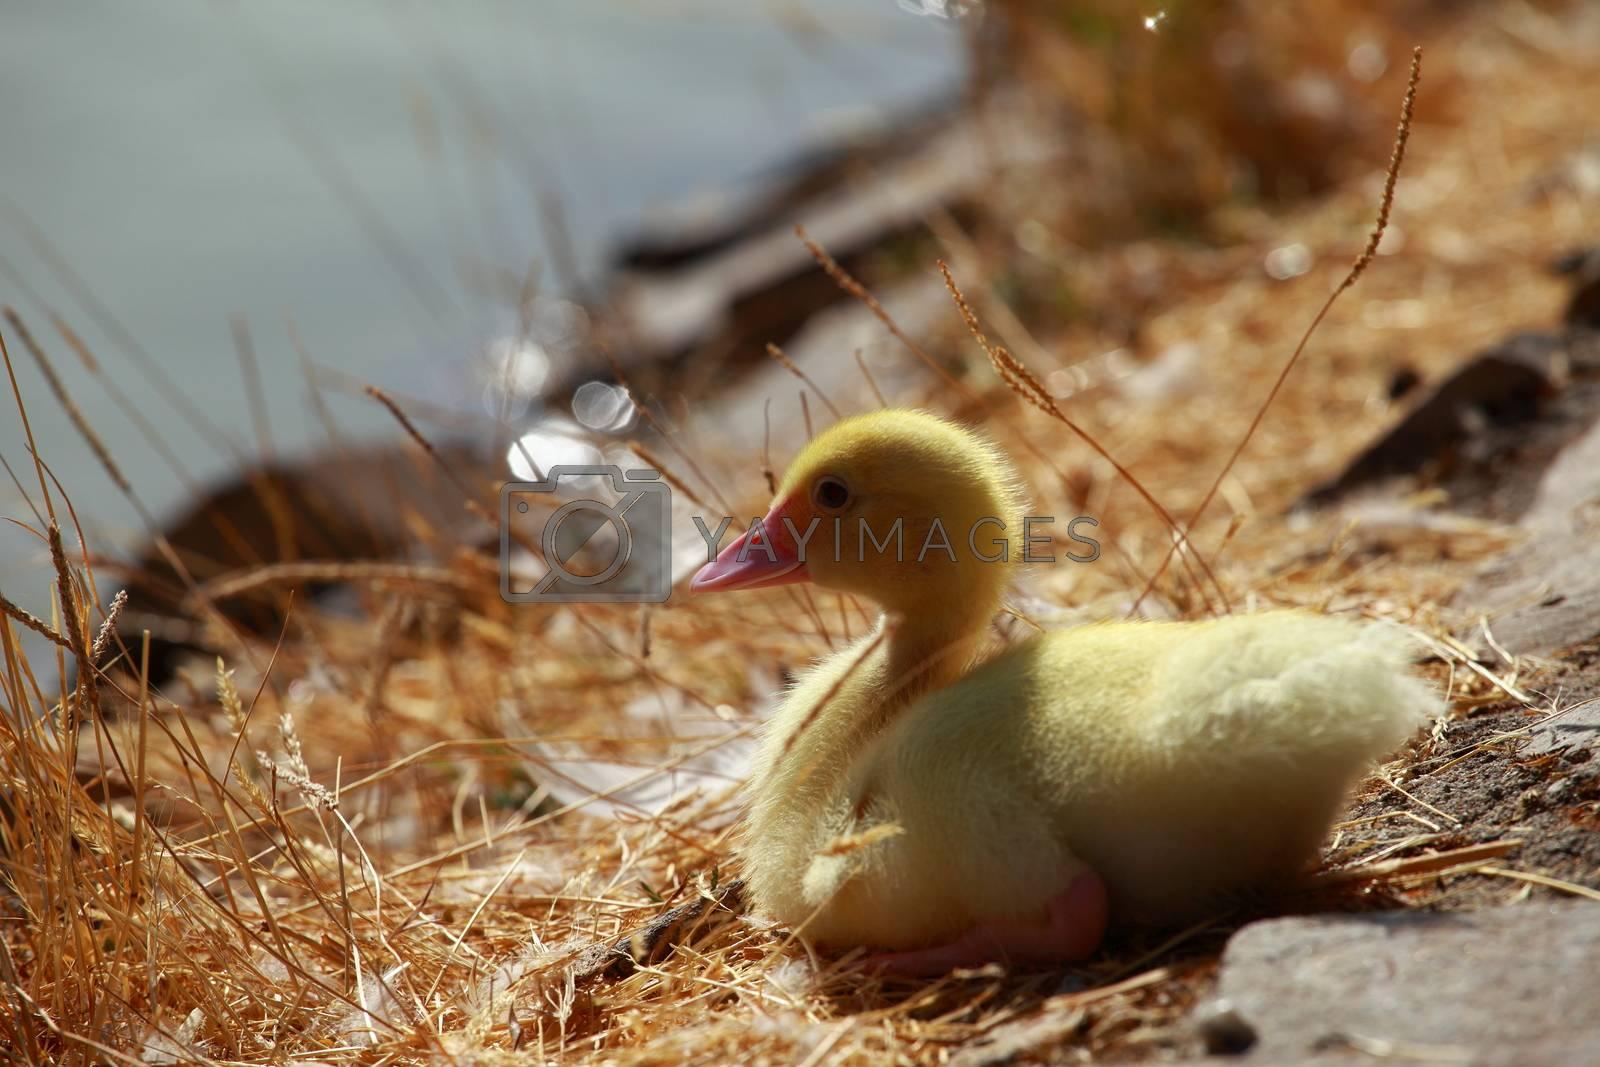 Mallard duck and baby ducklings  by Mariusz Prusaczyk